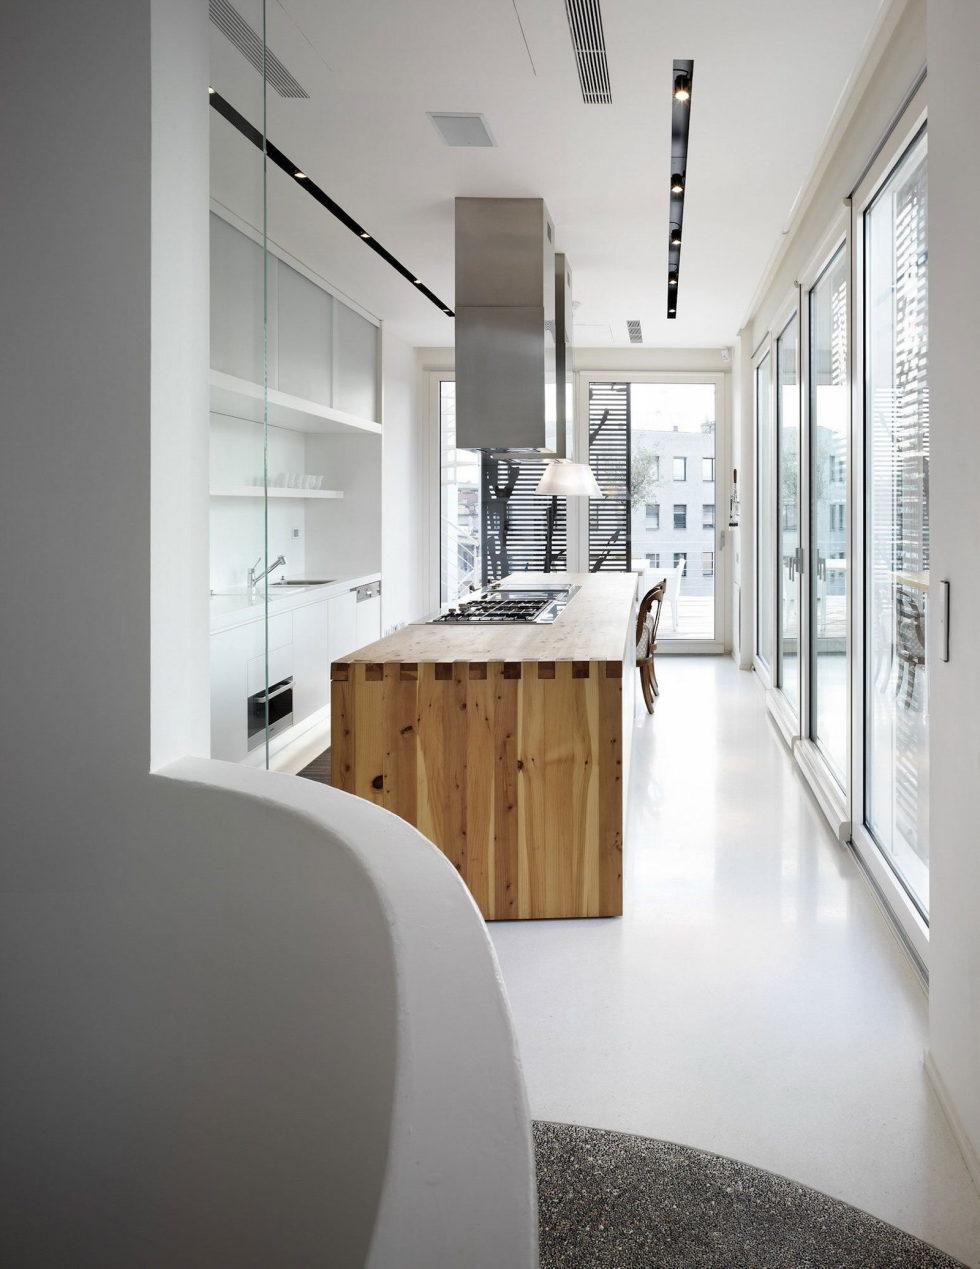 Three-level Apartments In Milan From Arassociati Architetti 5